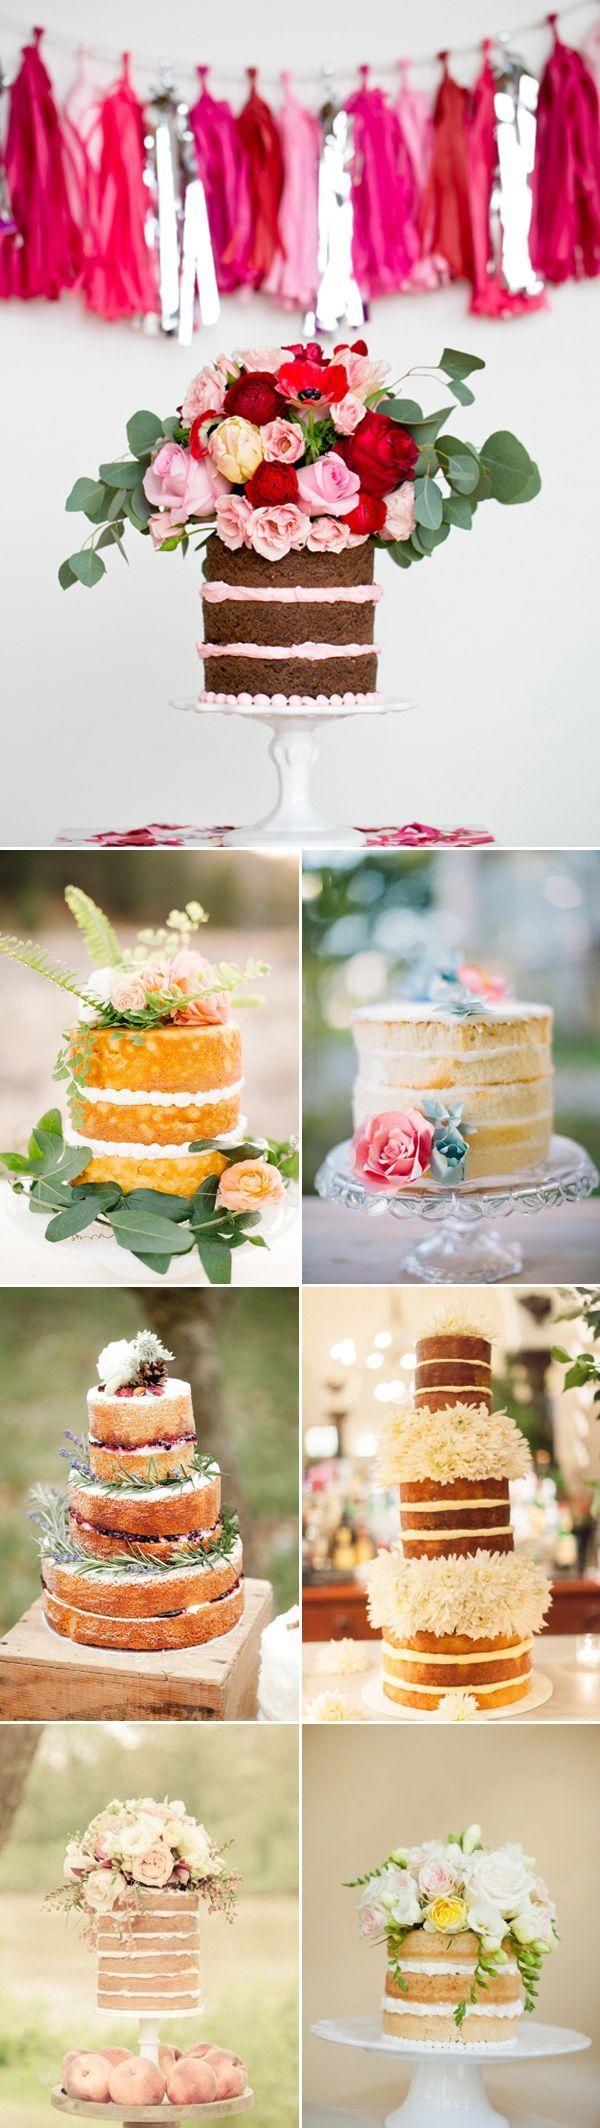 Naked cakes: Pasteles al desnudo, la nueva tendencia. | HG The Wedding Planner.